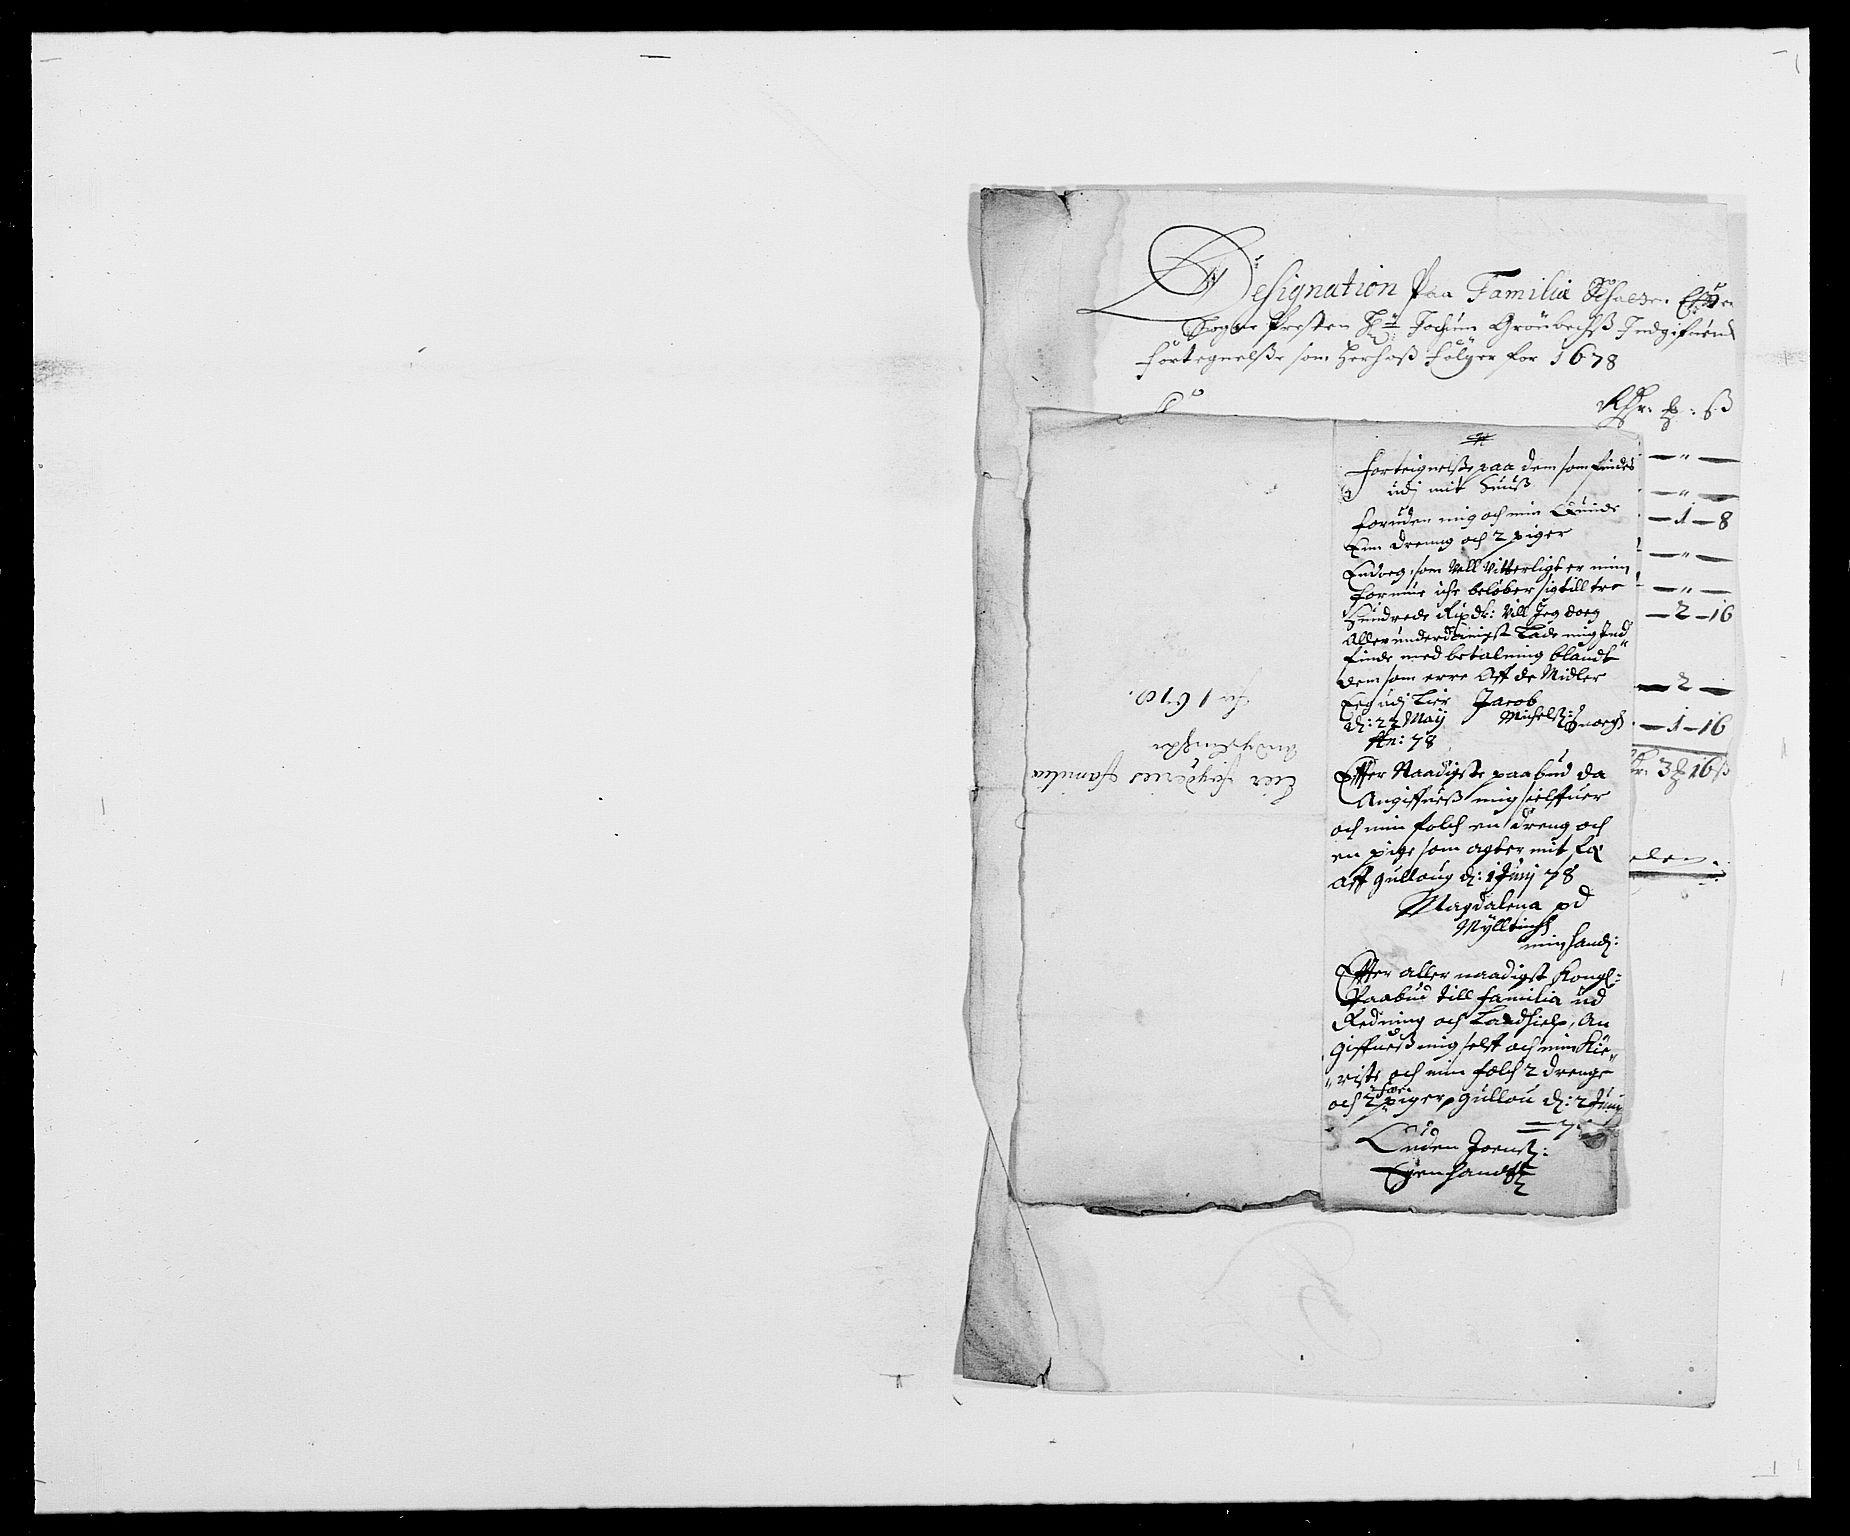 RA, Rentekammeret inntil 1814, Reviderte regnskaper, Fogderegnskap, R27/L1686: Fogderegnskap Lier, 1678-1686, s. 105